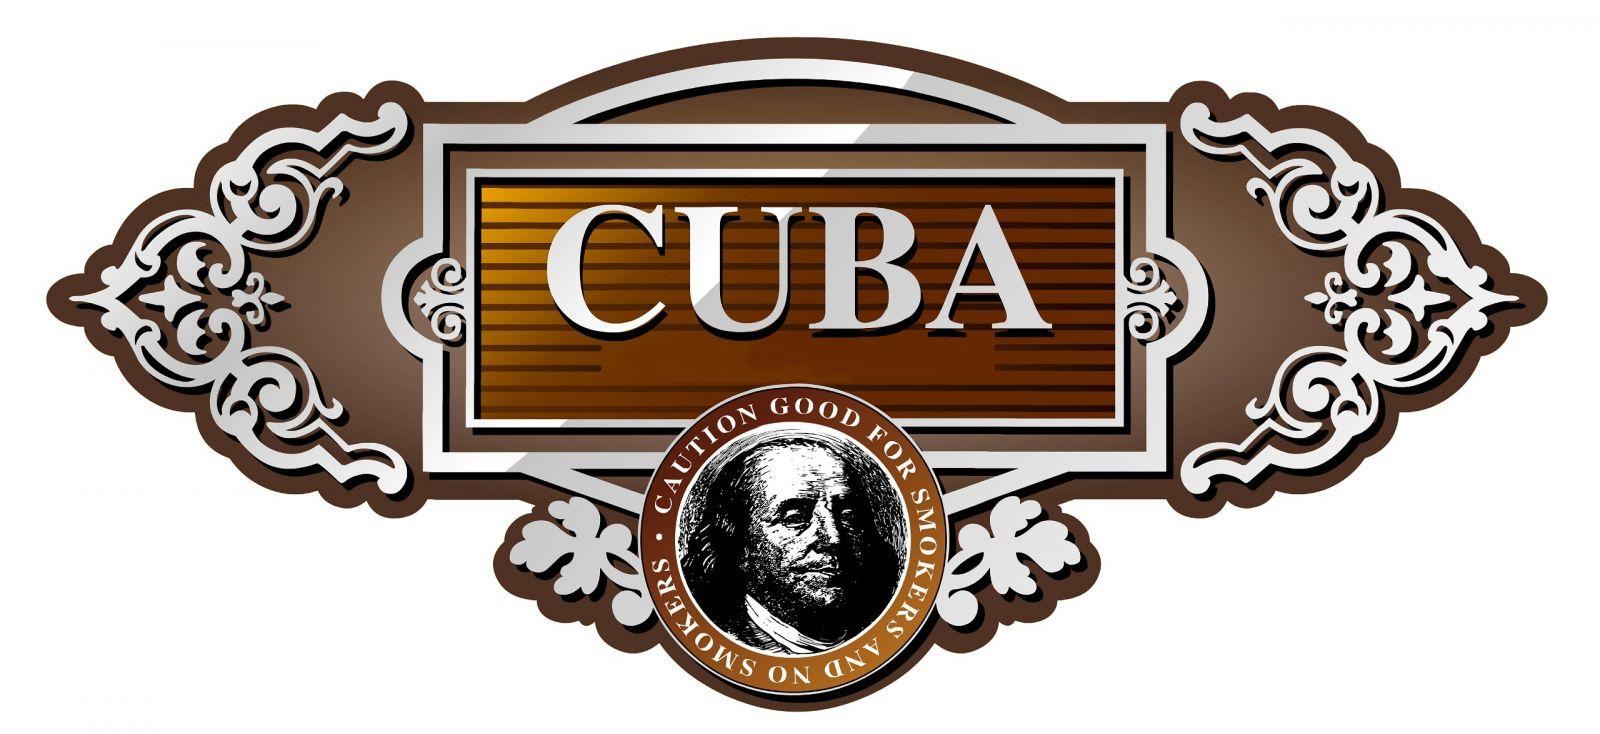 deb916b2f6 oiOferta    Perfume Cuba Grey Masculino Eau de Toilette 35ml